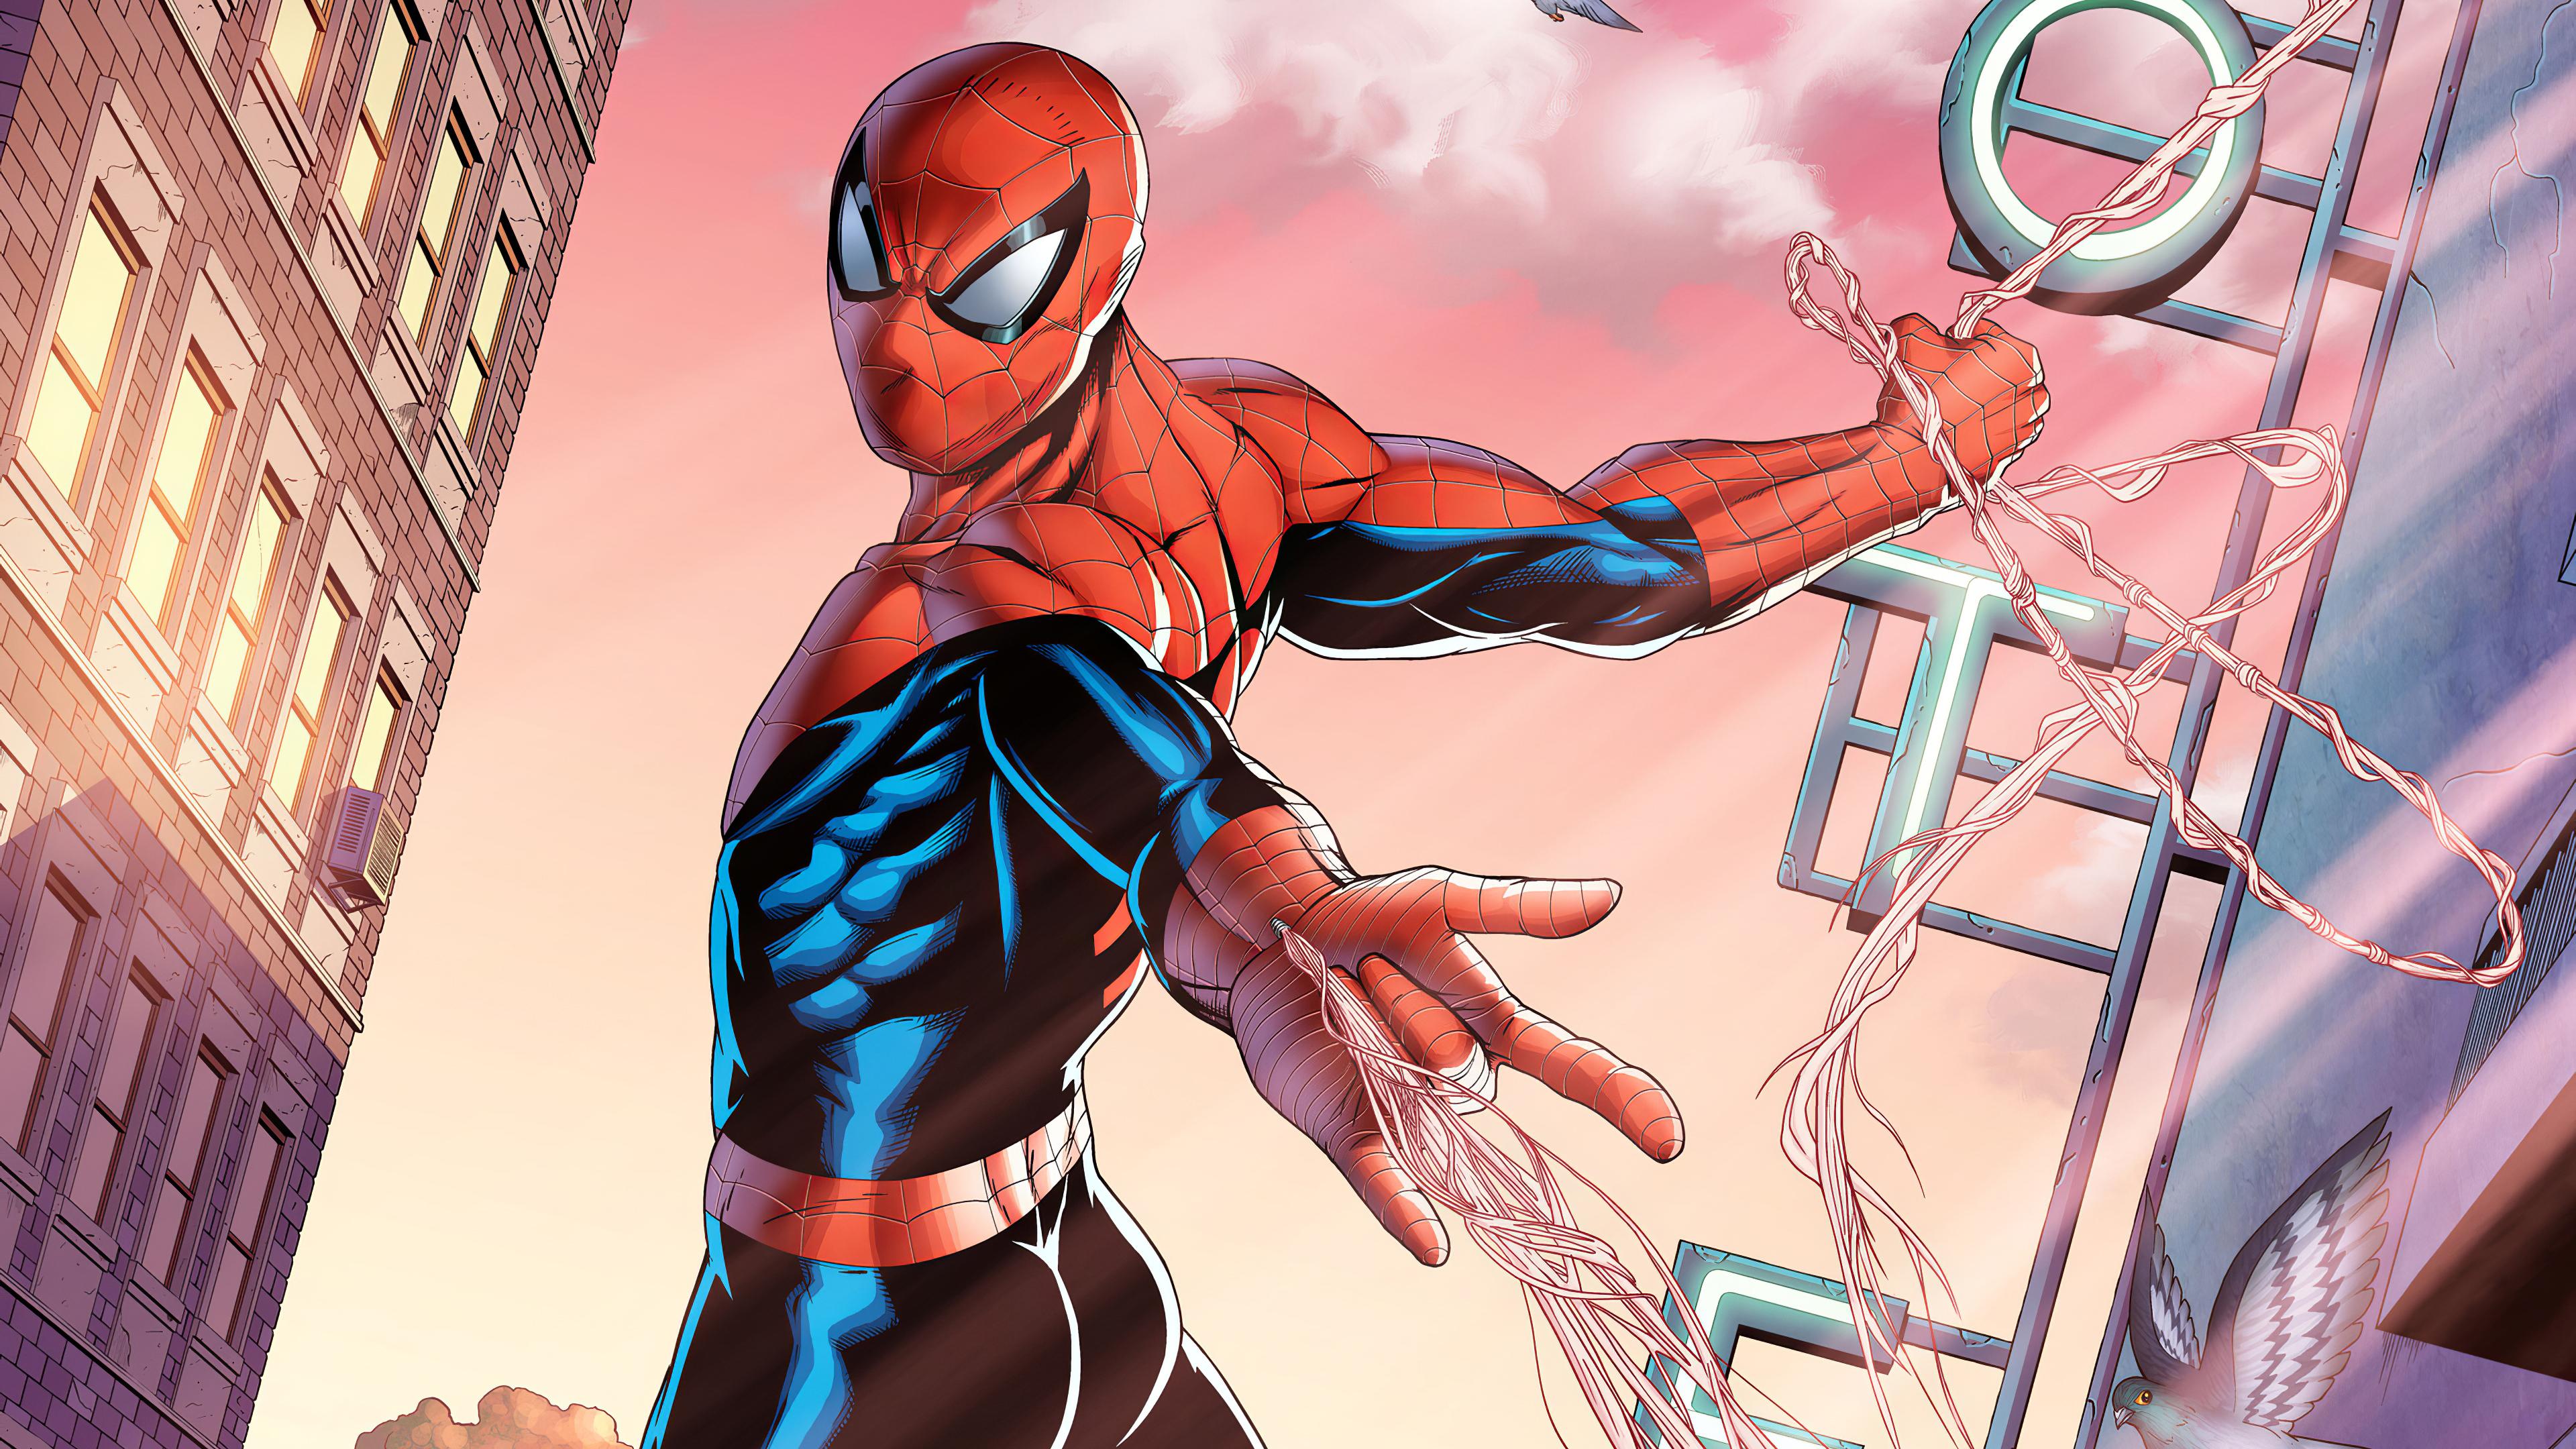 Spiderman Comic Art Spider man wallpapers, spider man ...